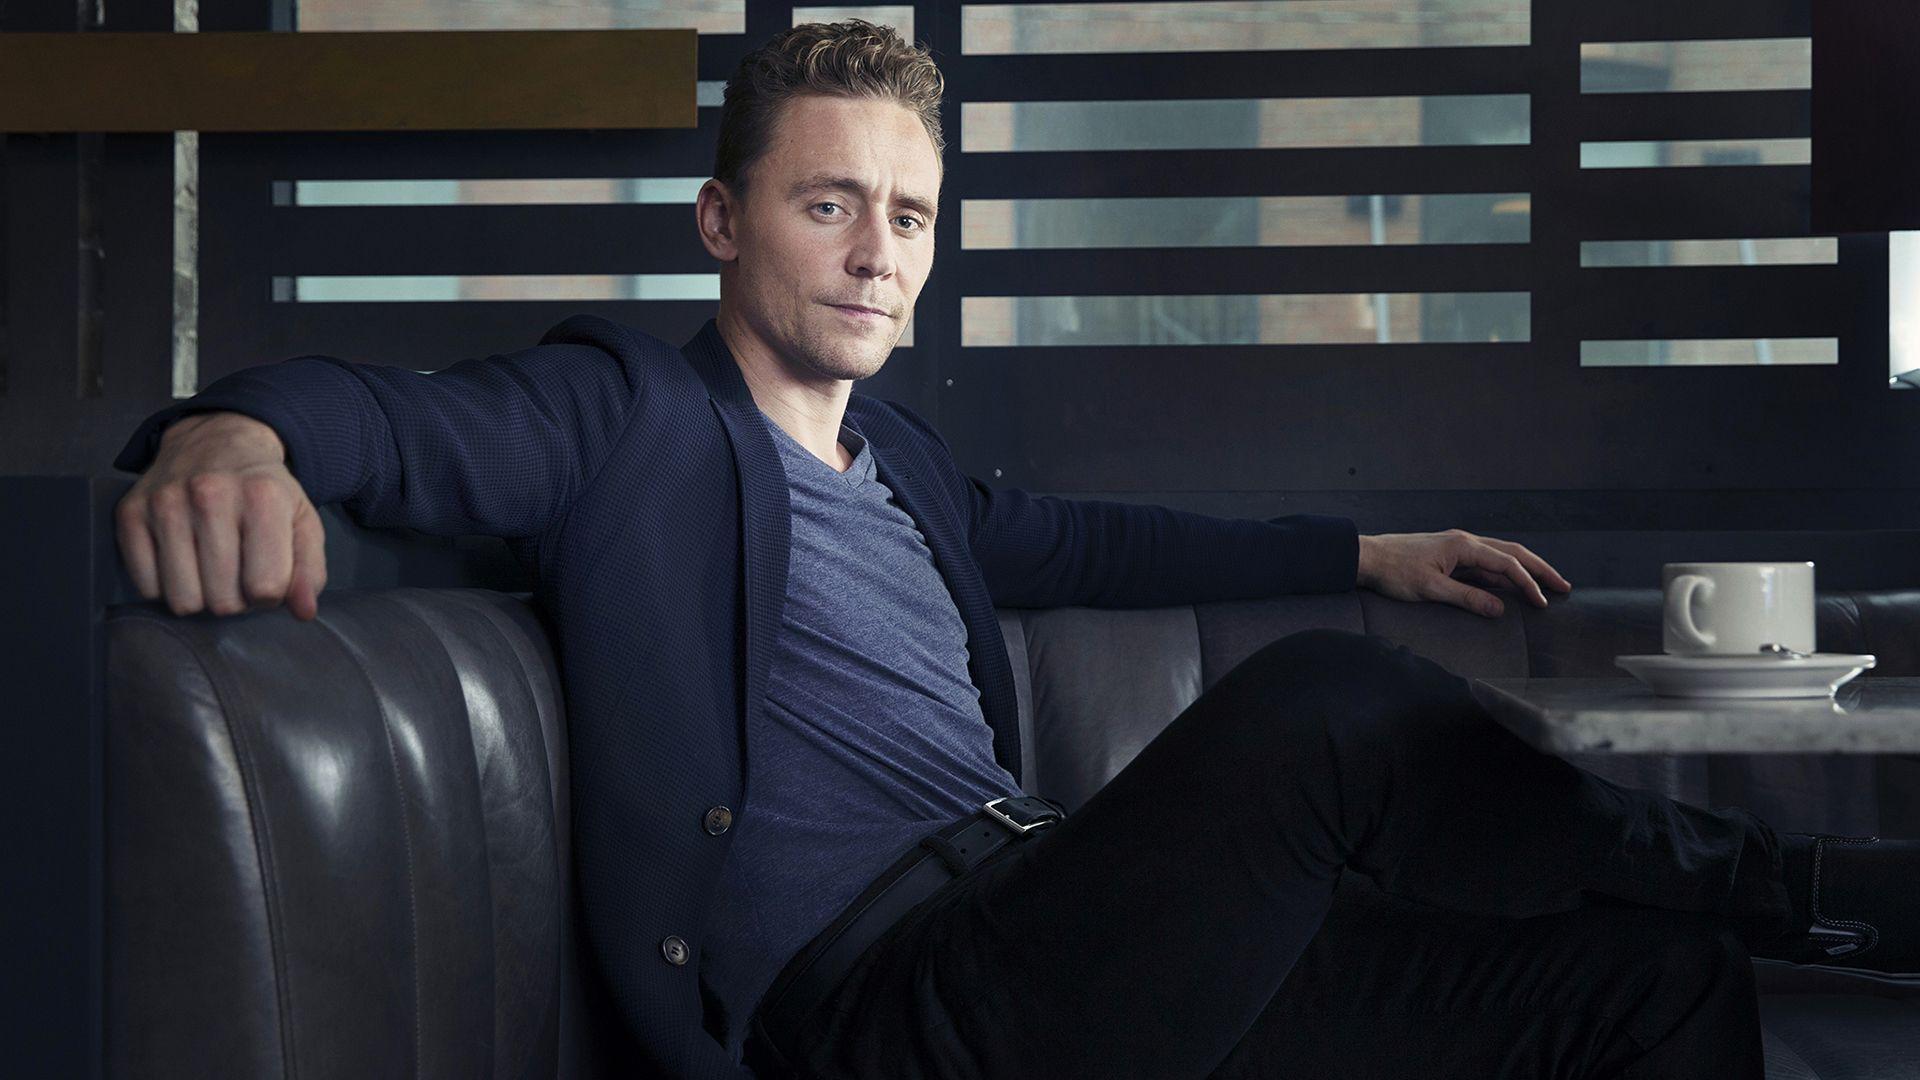 Tom Hiddleston Hnxm look